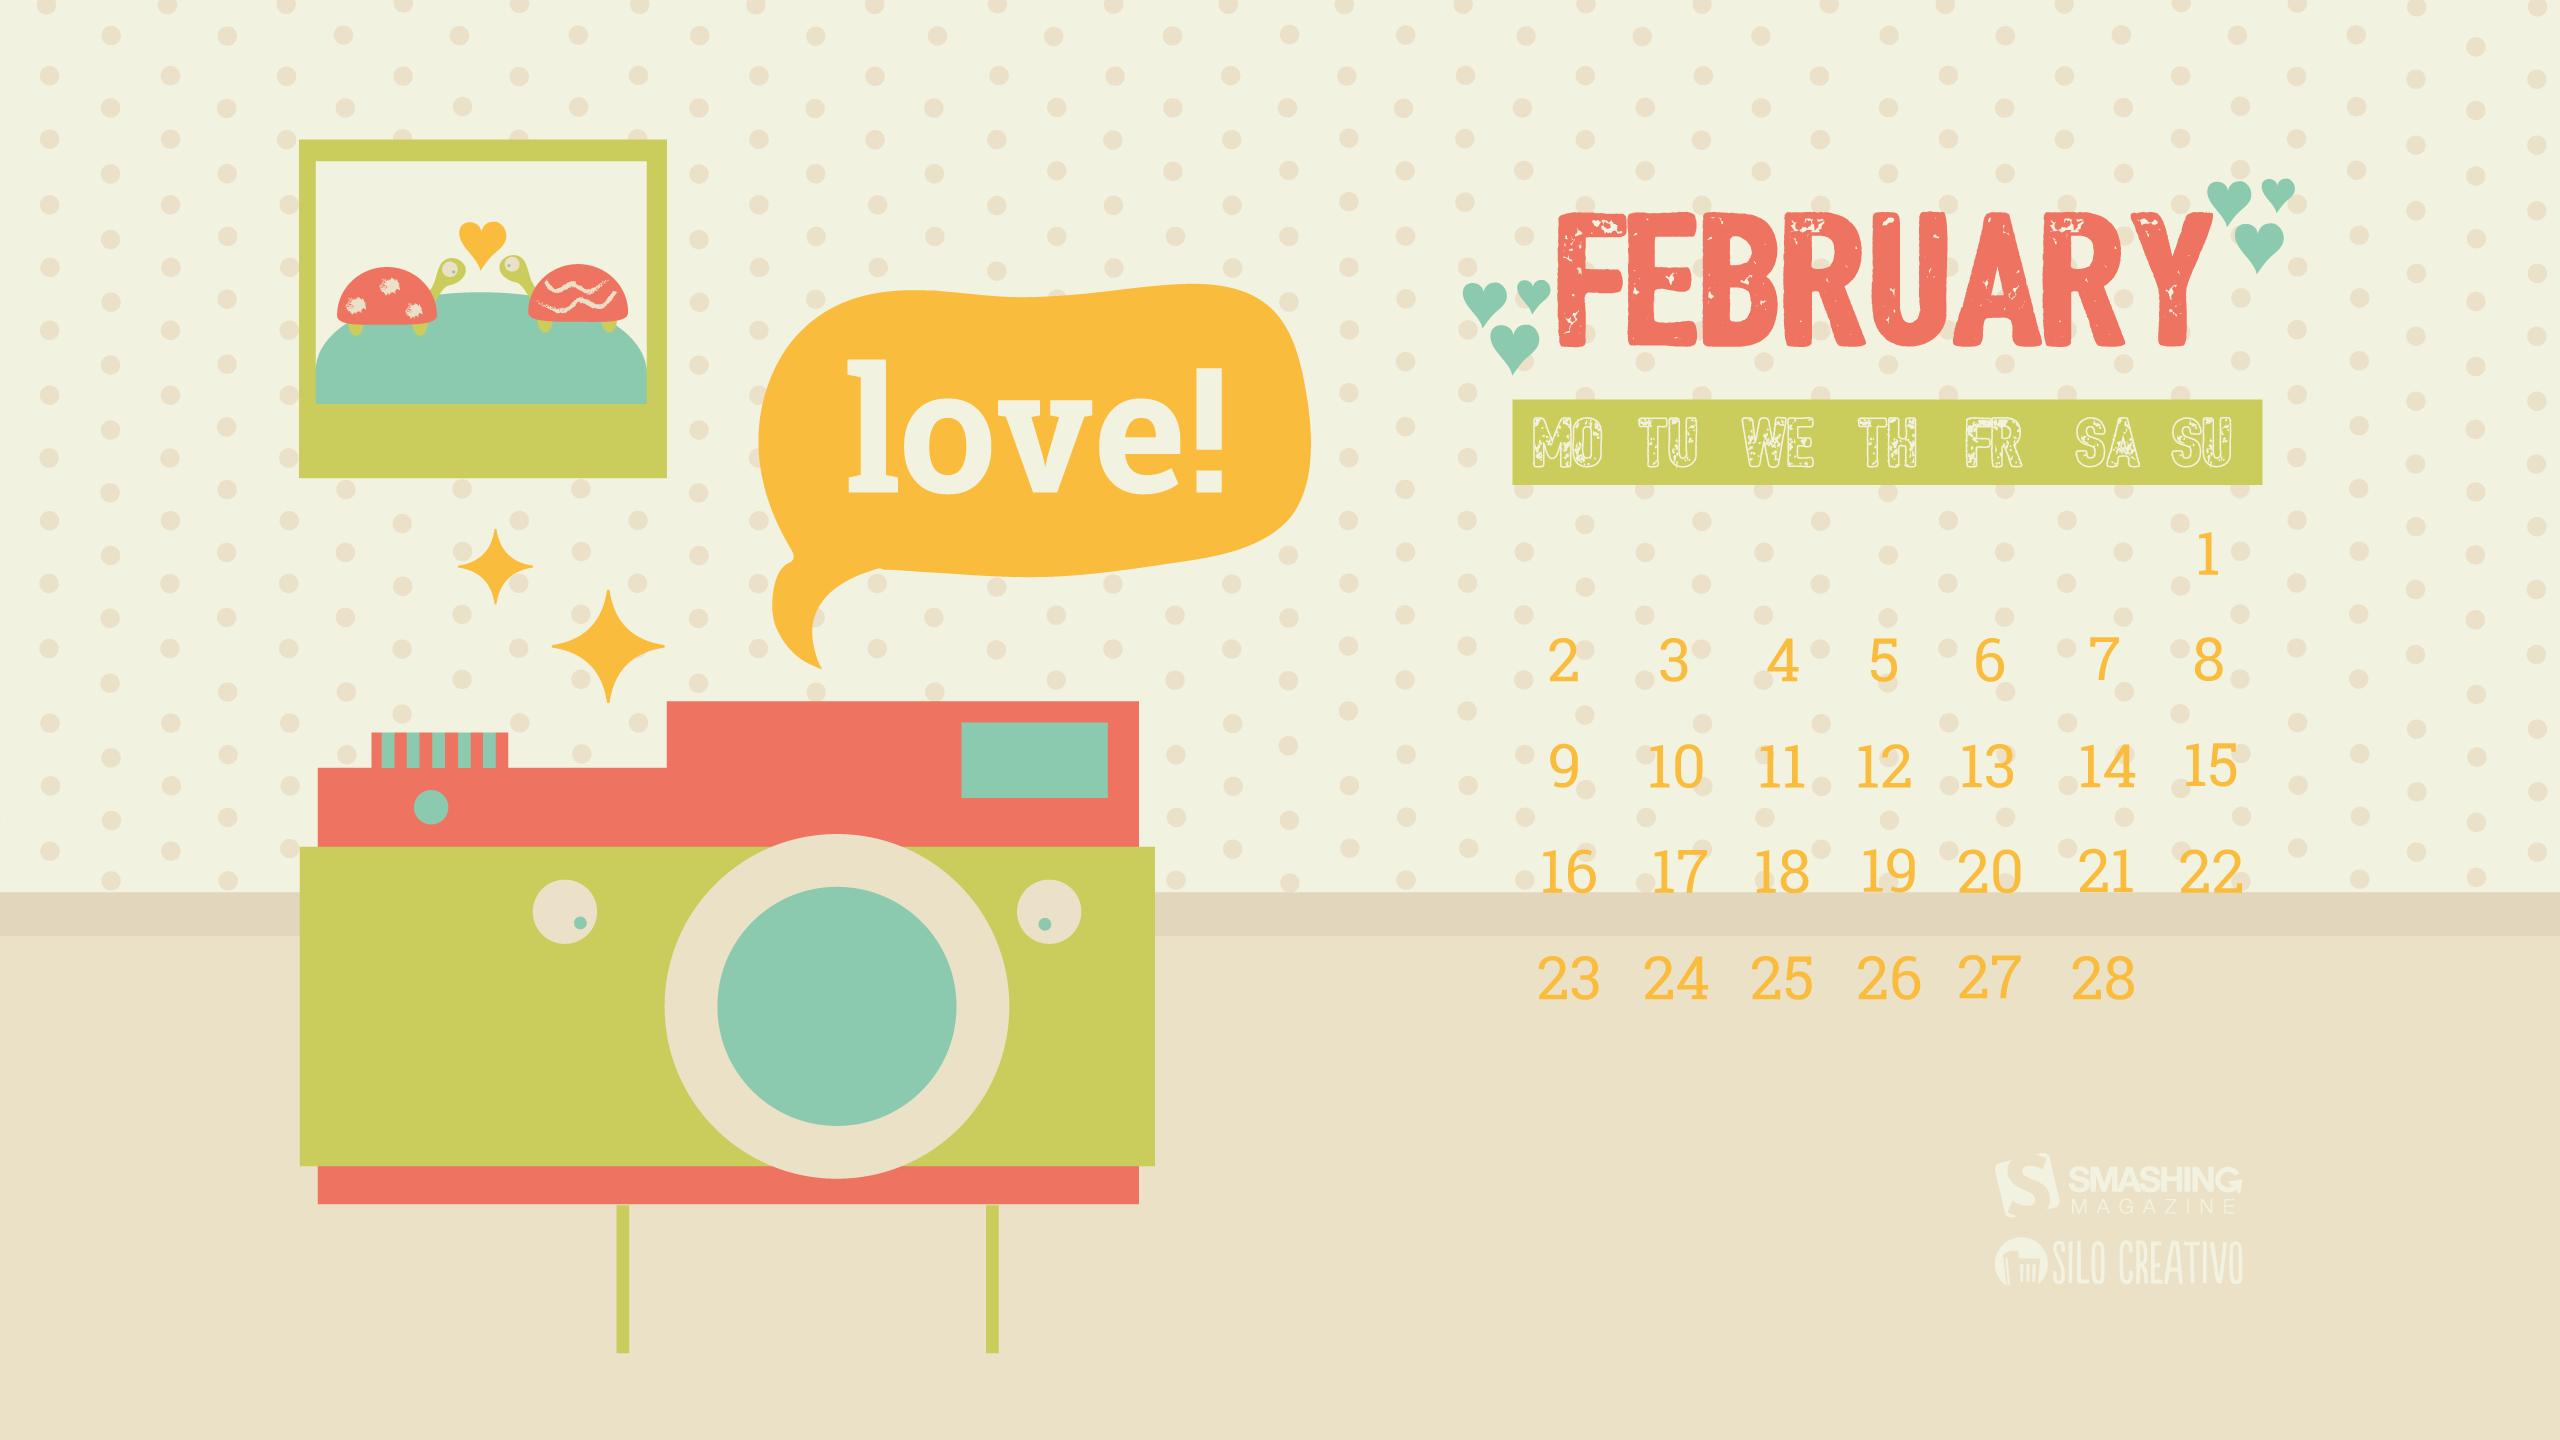 February 2015 Wallpaper Calendar 36626 ISOFTWEB 2560x1440